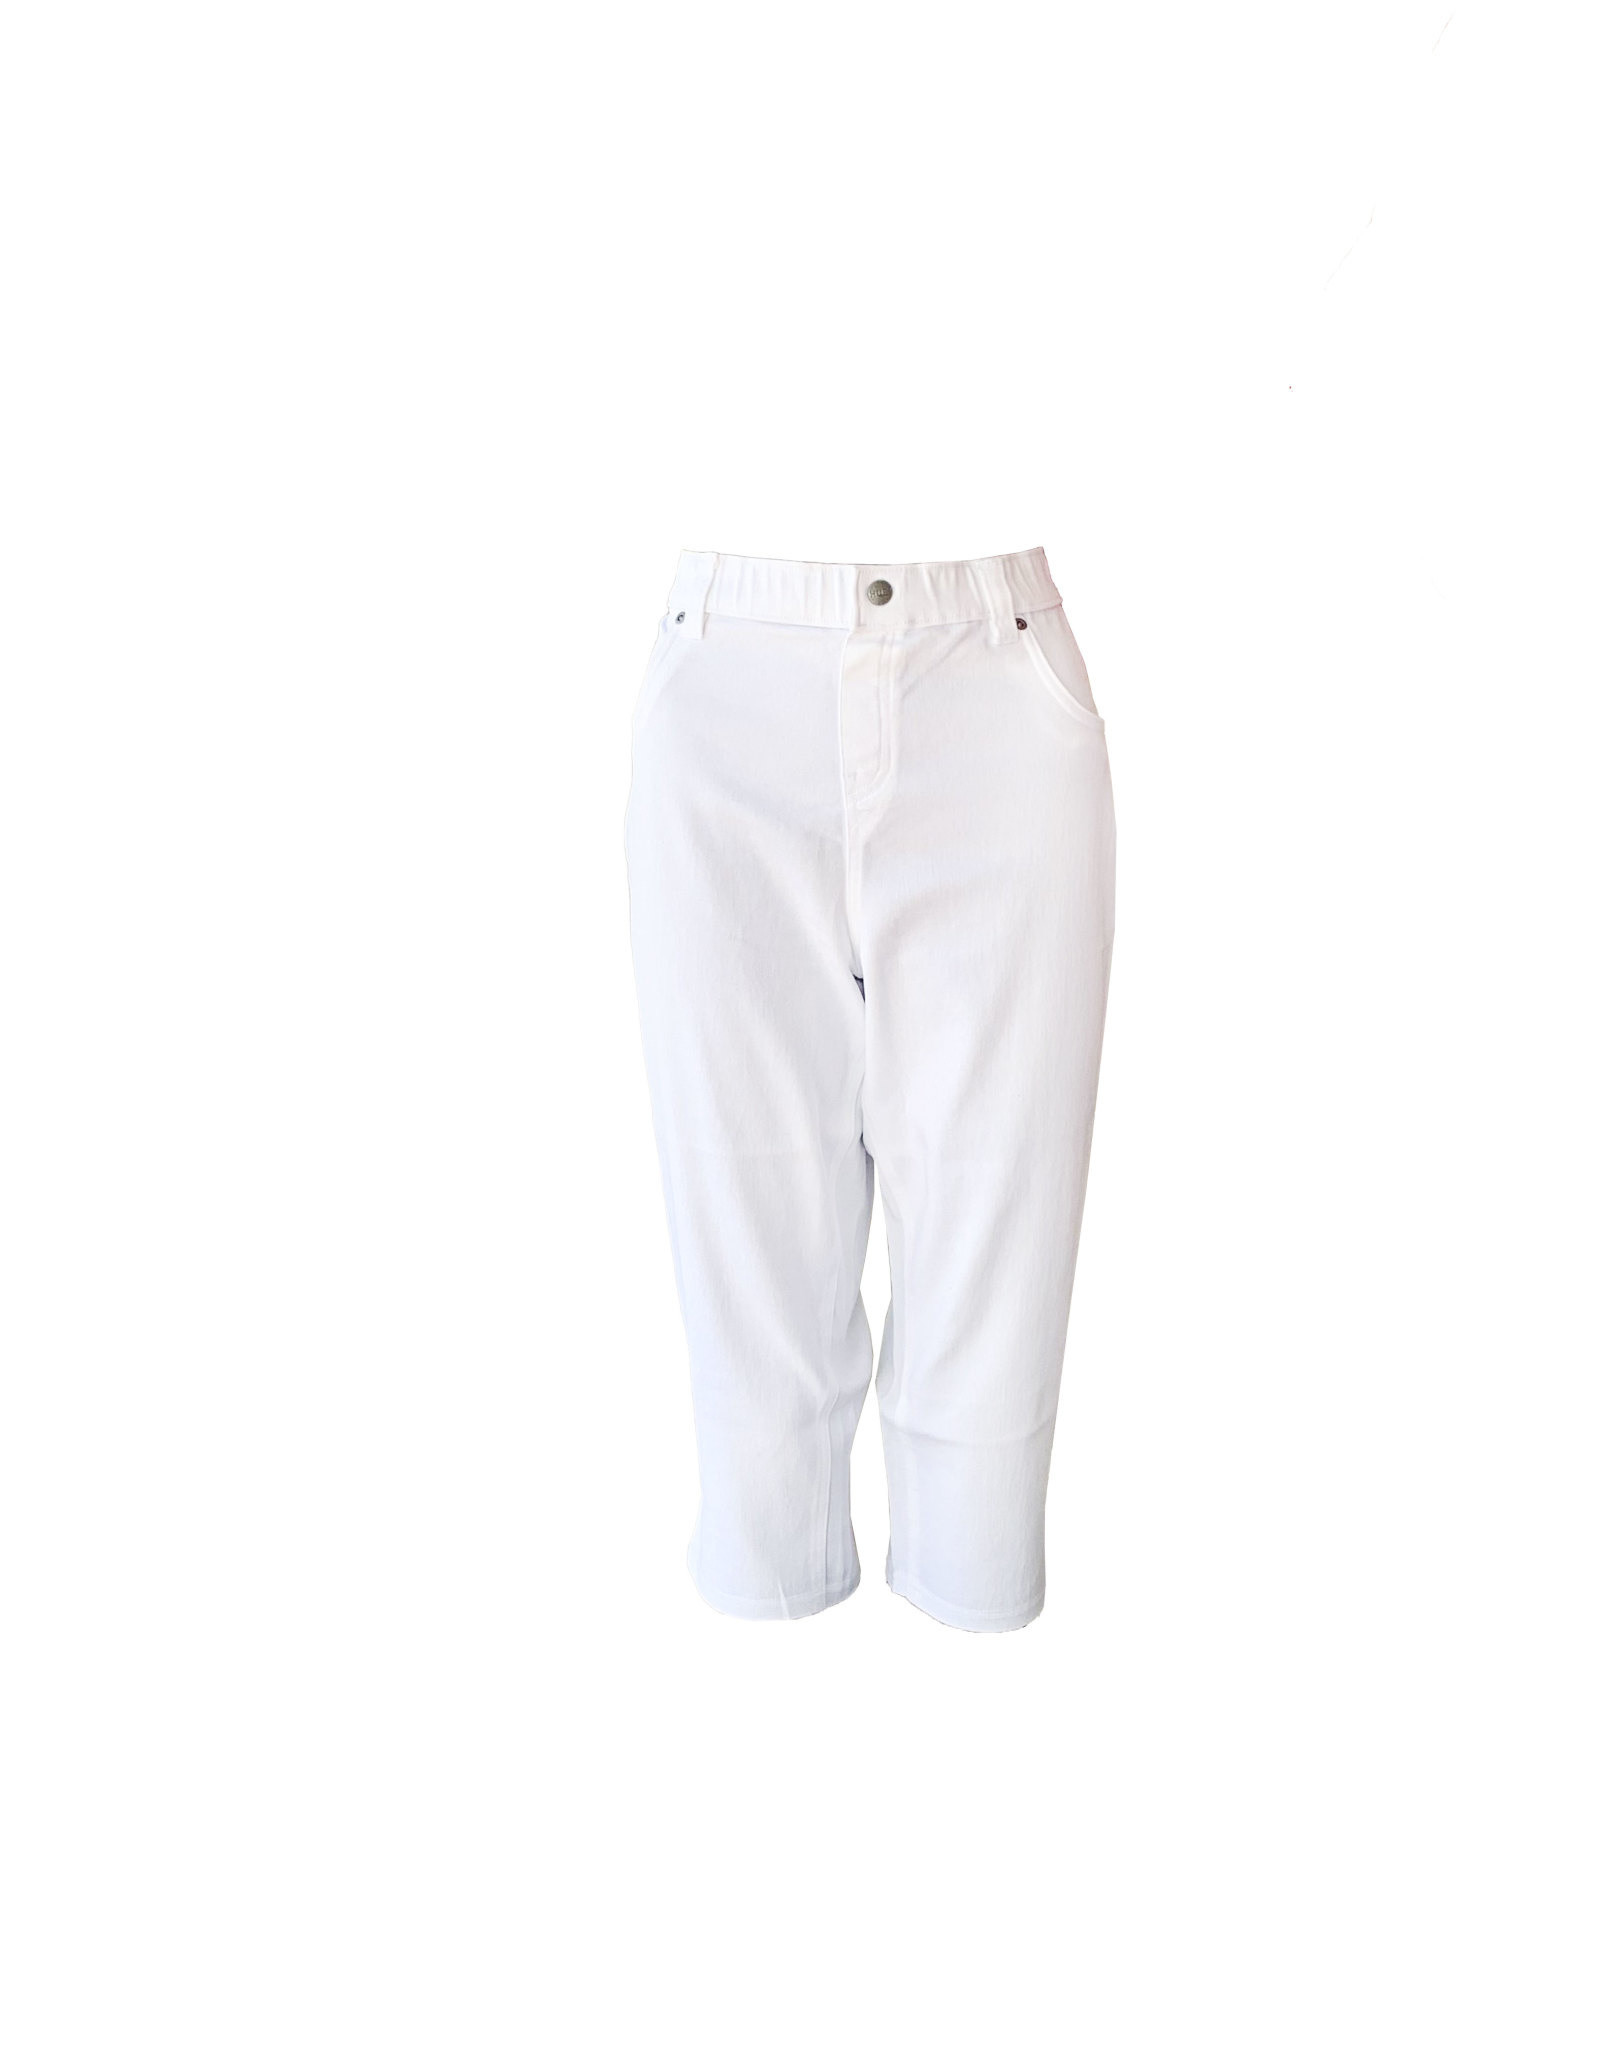 HUE Hue Ultra Soft Denim Capri  Size L